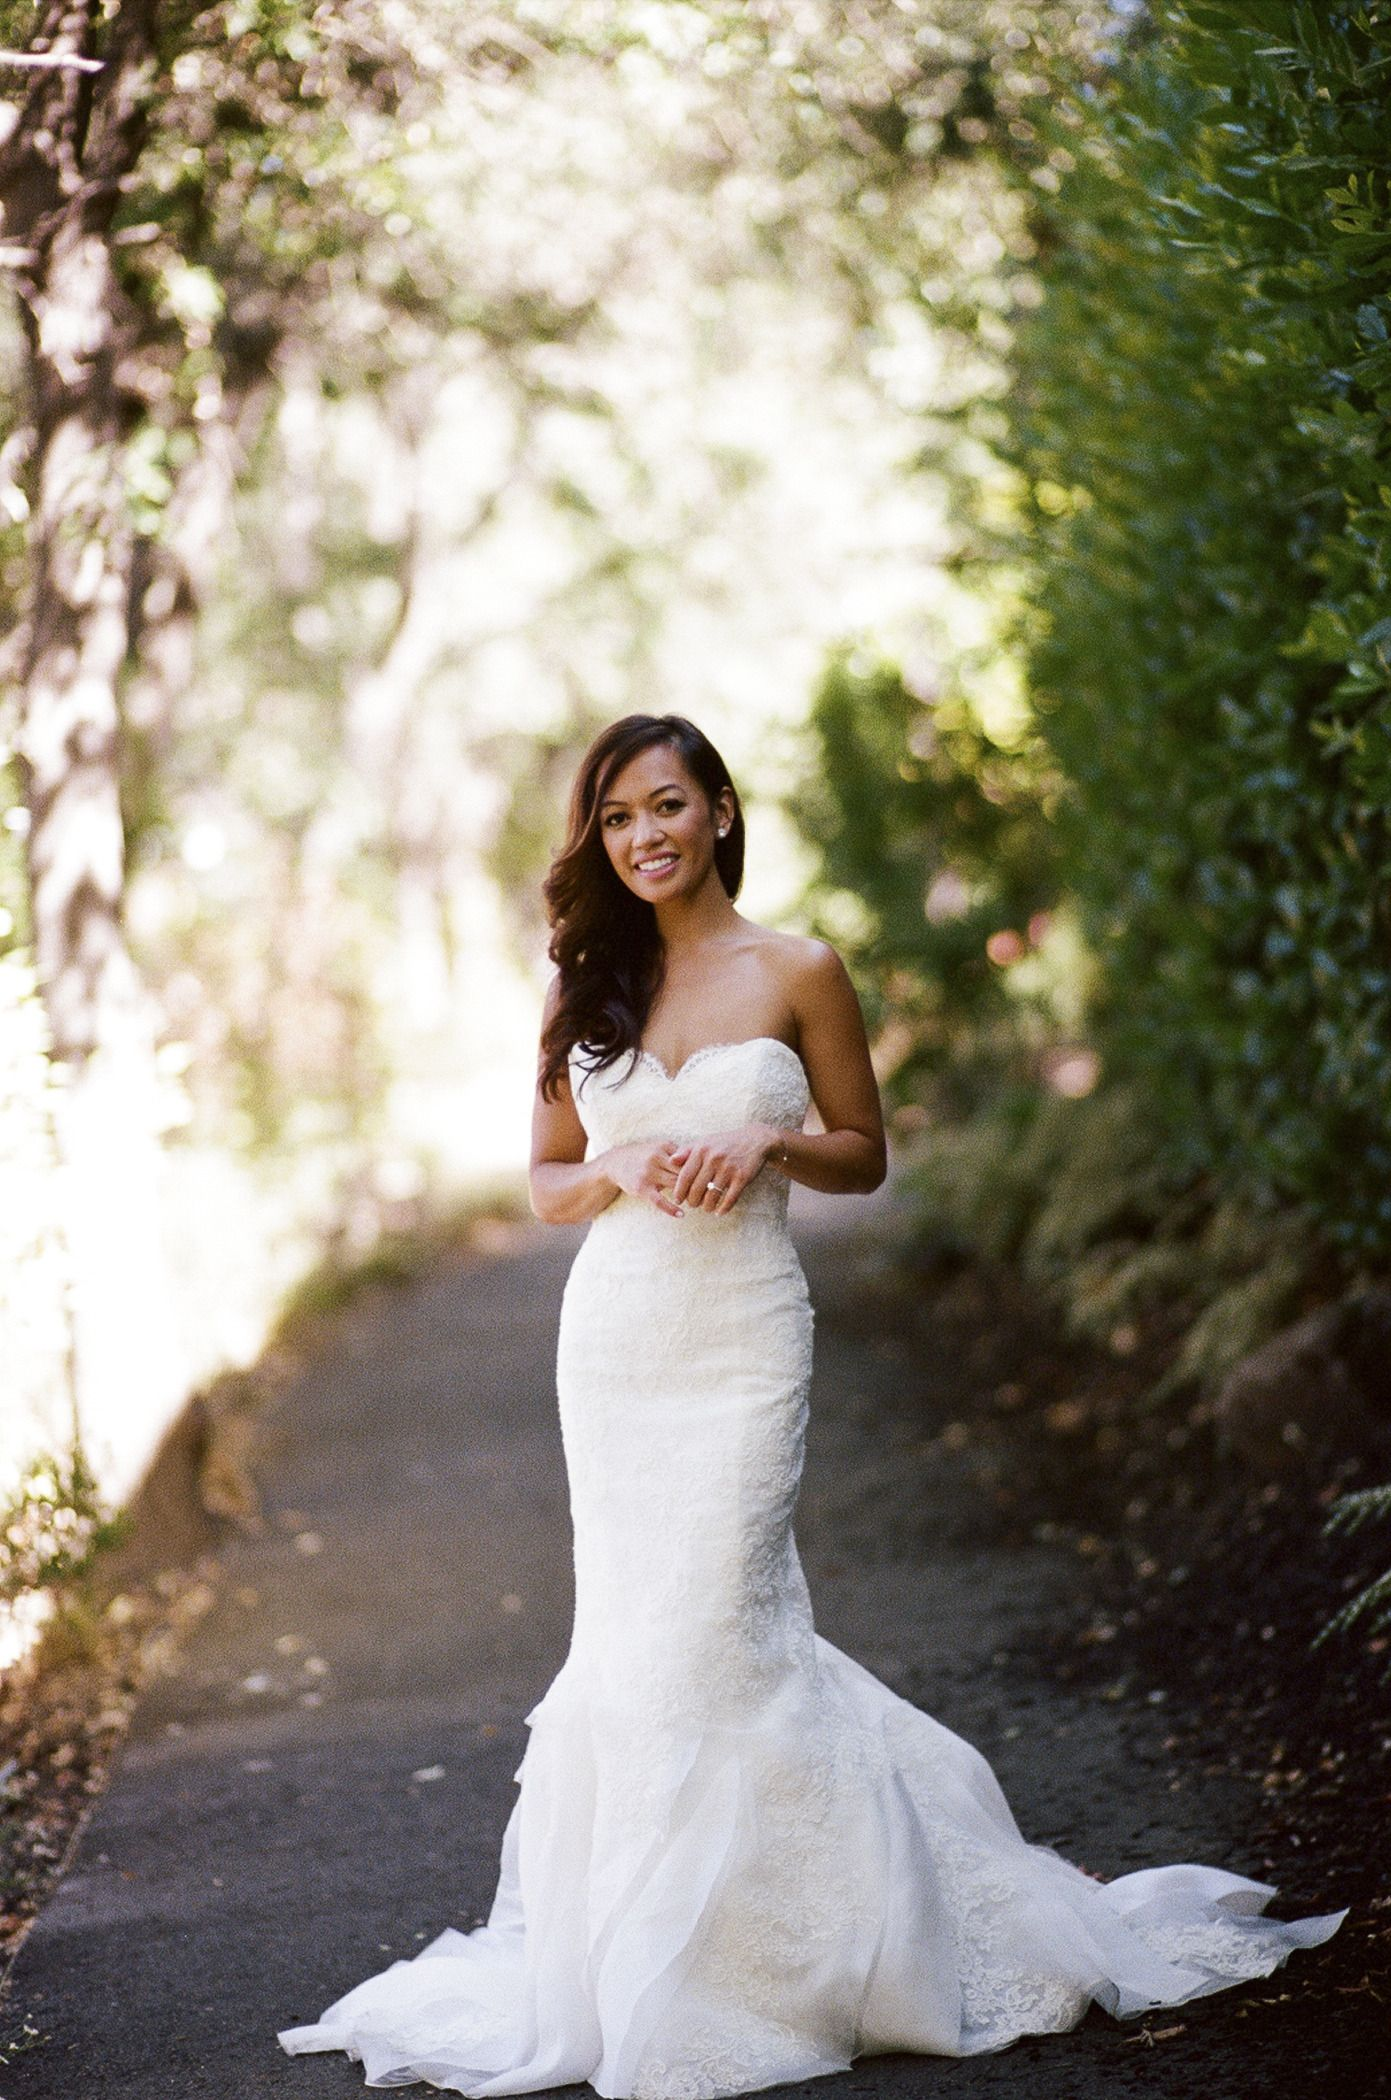 Napa Valley Wedding at The Vintage Estate | Brautkleid meerjungfrau ...